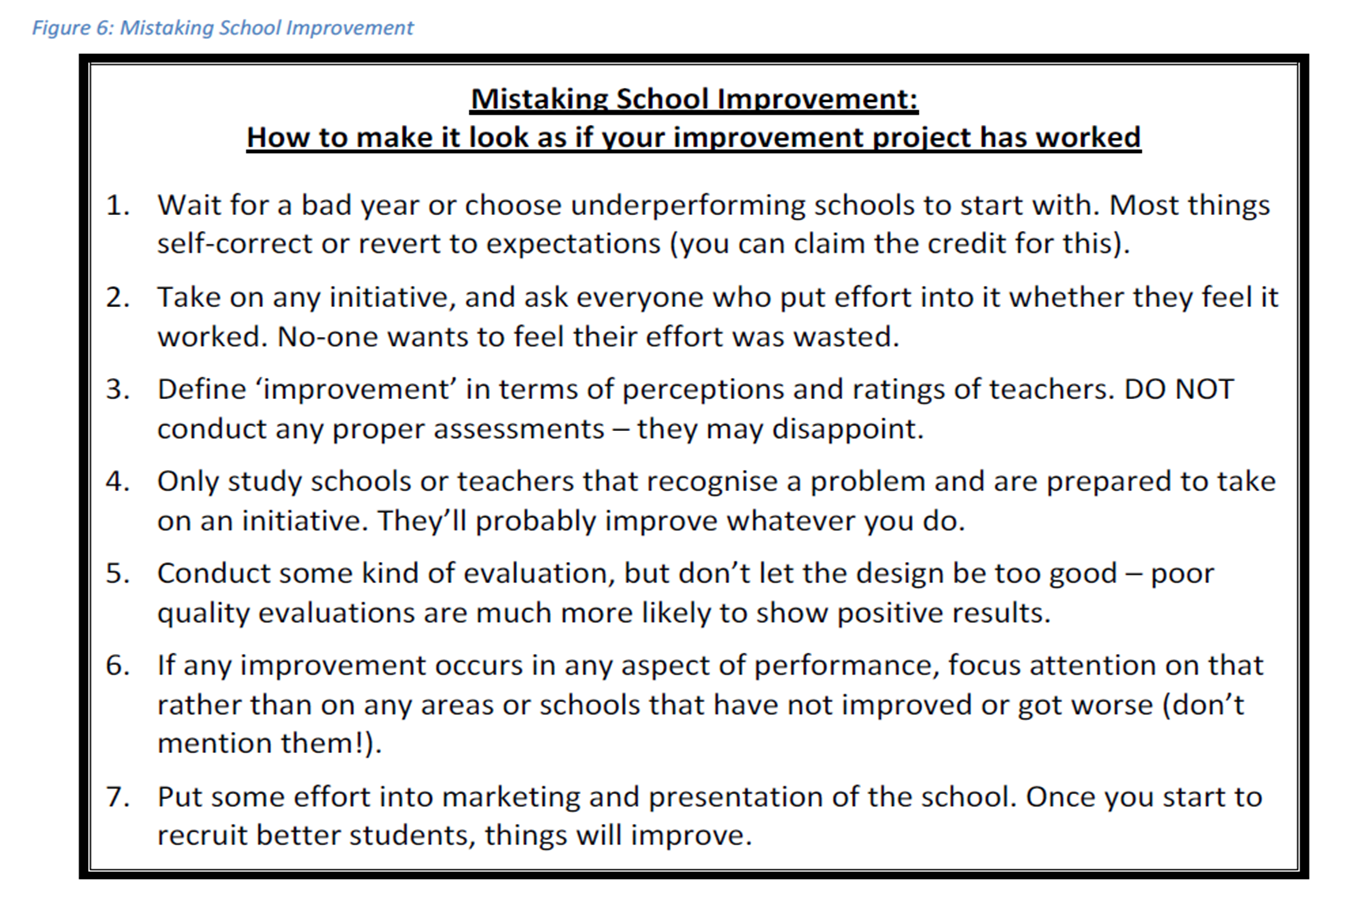 Improving Education Fig 6 Mistaking School Improvement